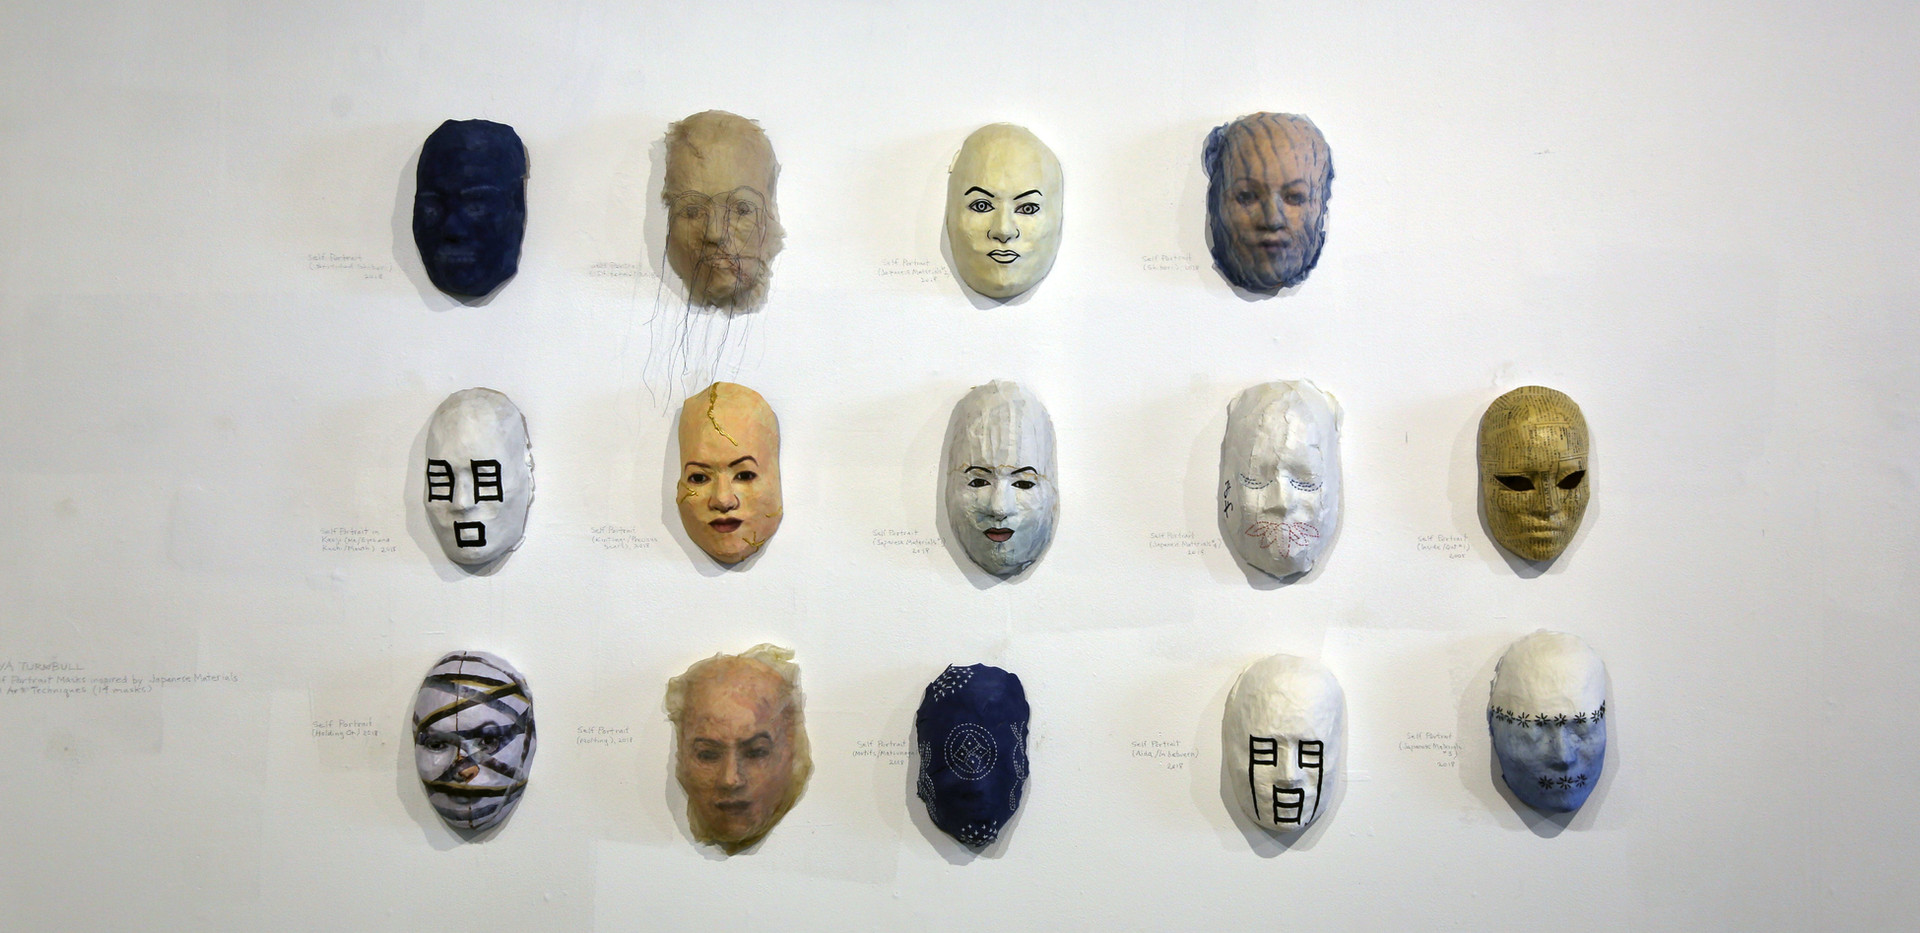 MTurnbull-Mask Exhibit at JCCC4